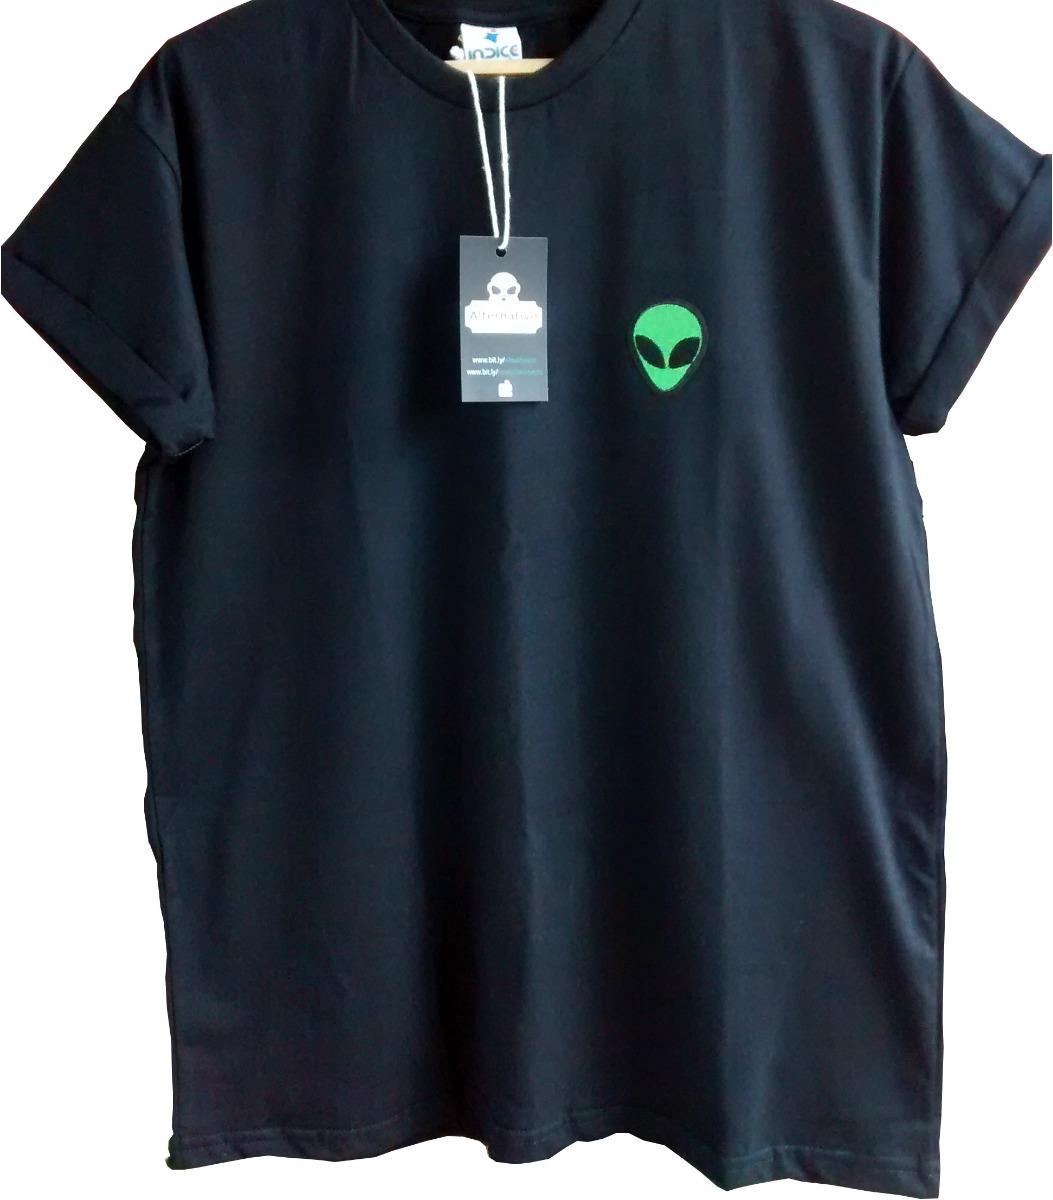 dd0ce61749 camiseta alien tumblr vinho patch et ufo masculina feminina. Carregando  zoom.